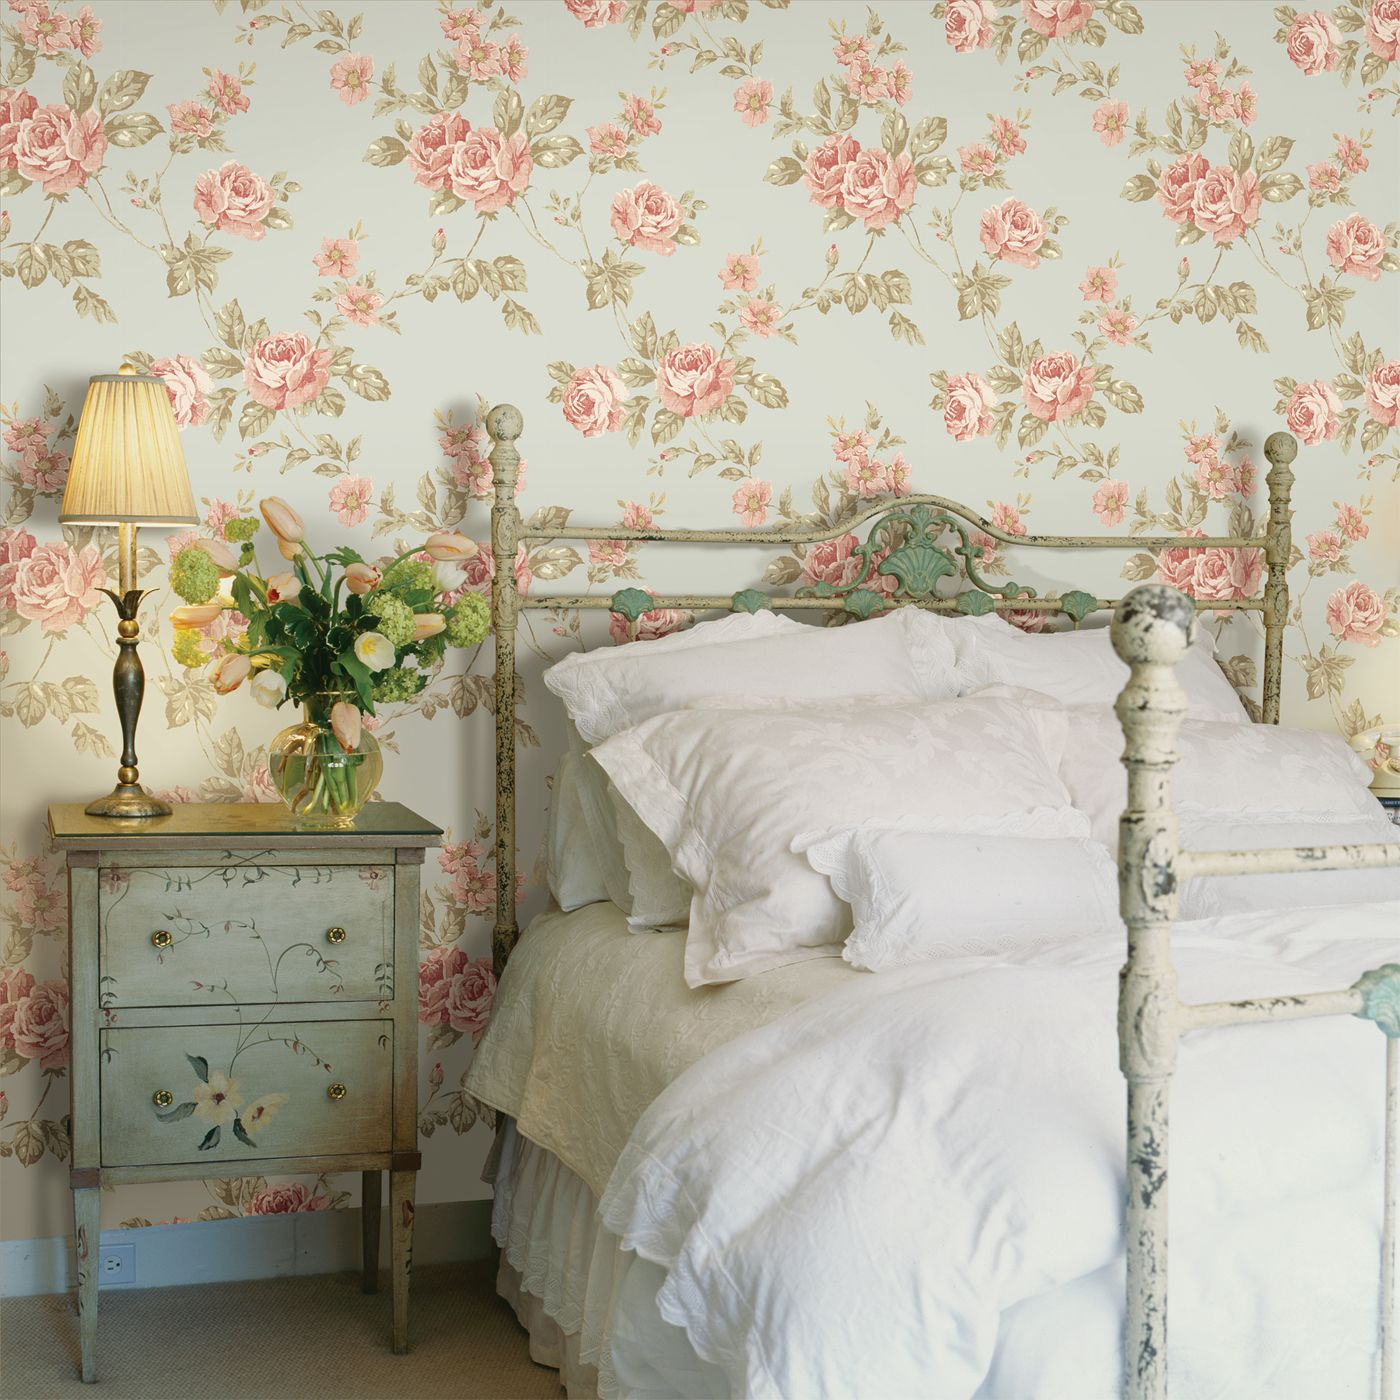 Розы на стене в спальне стиля прованс